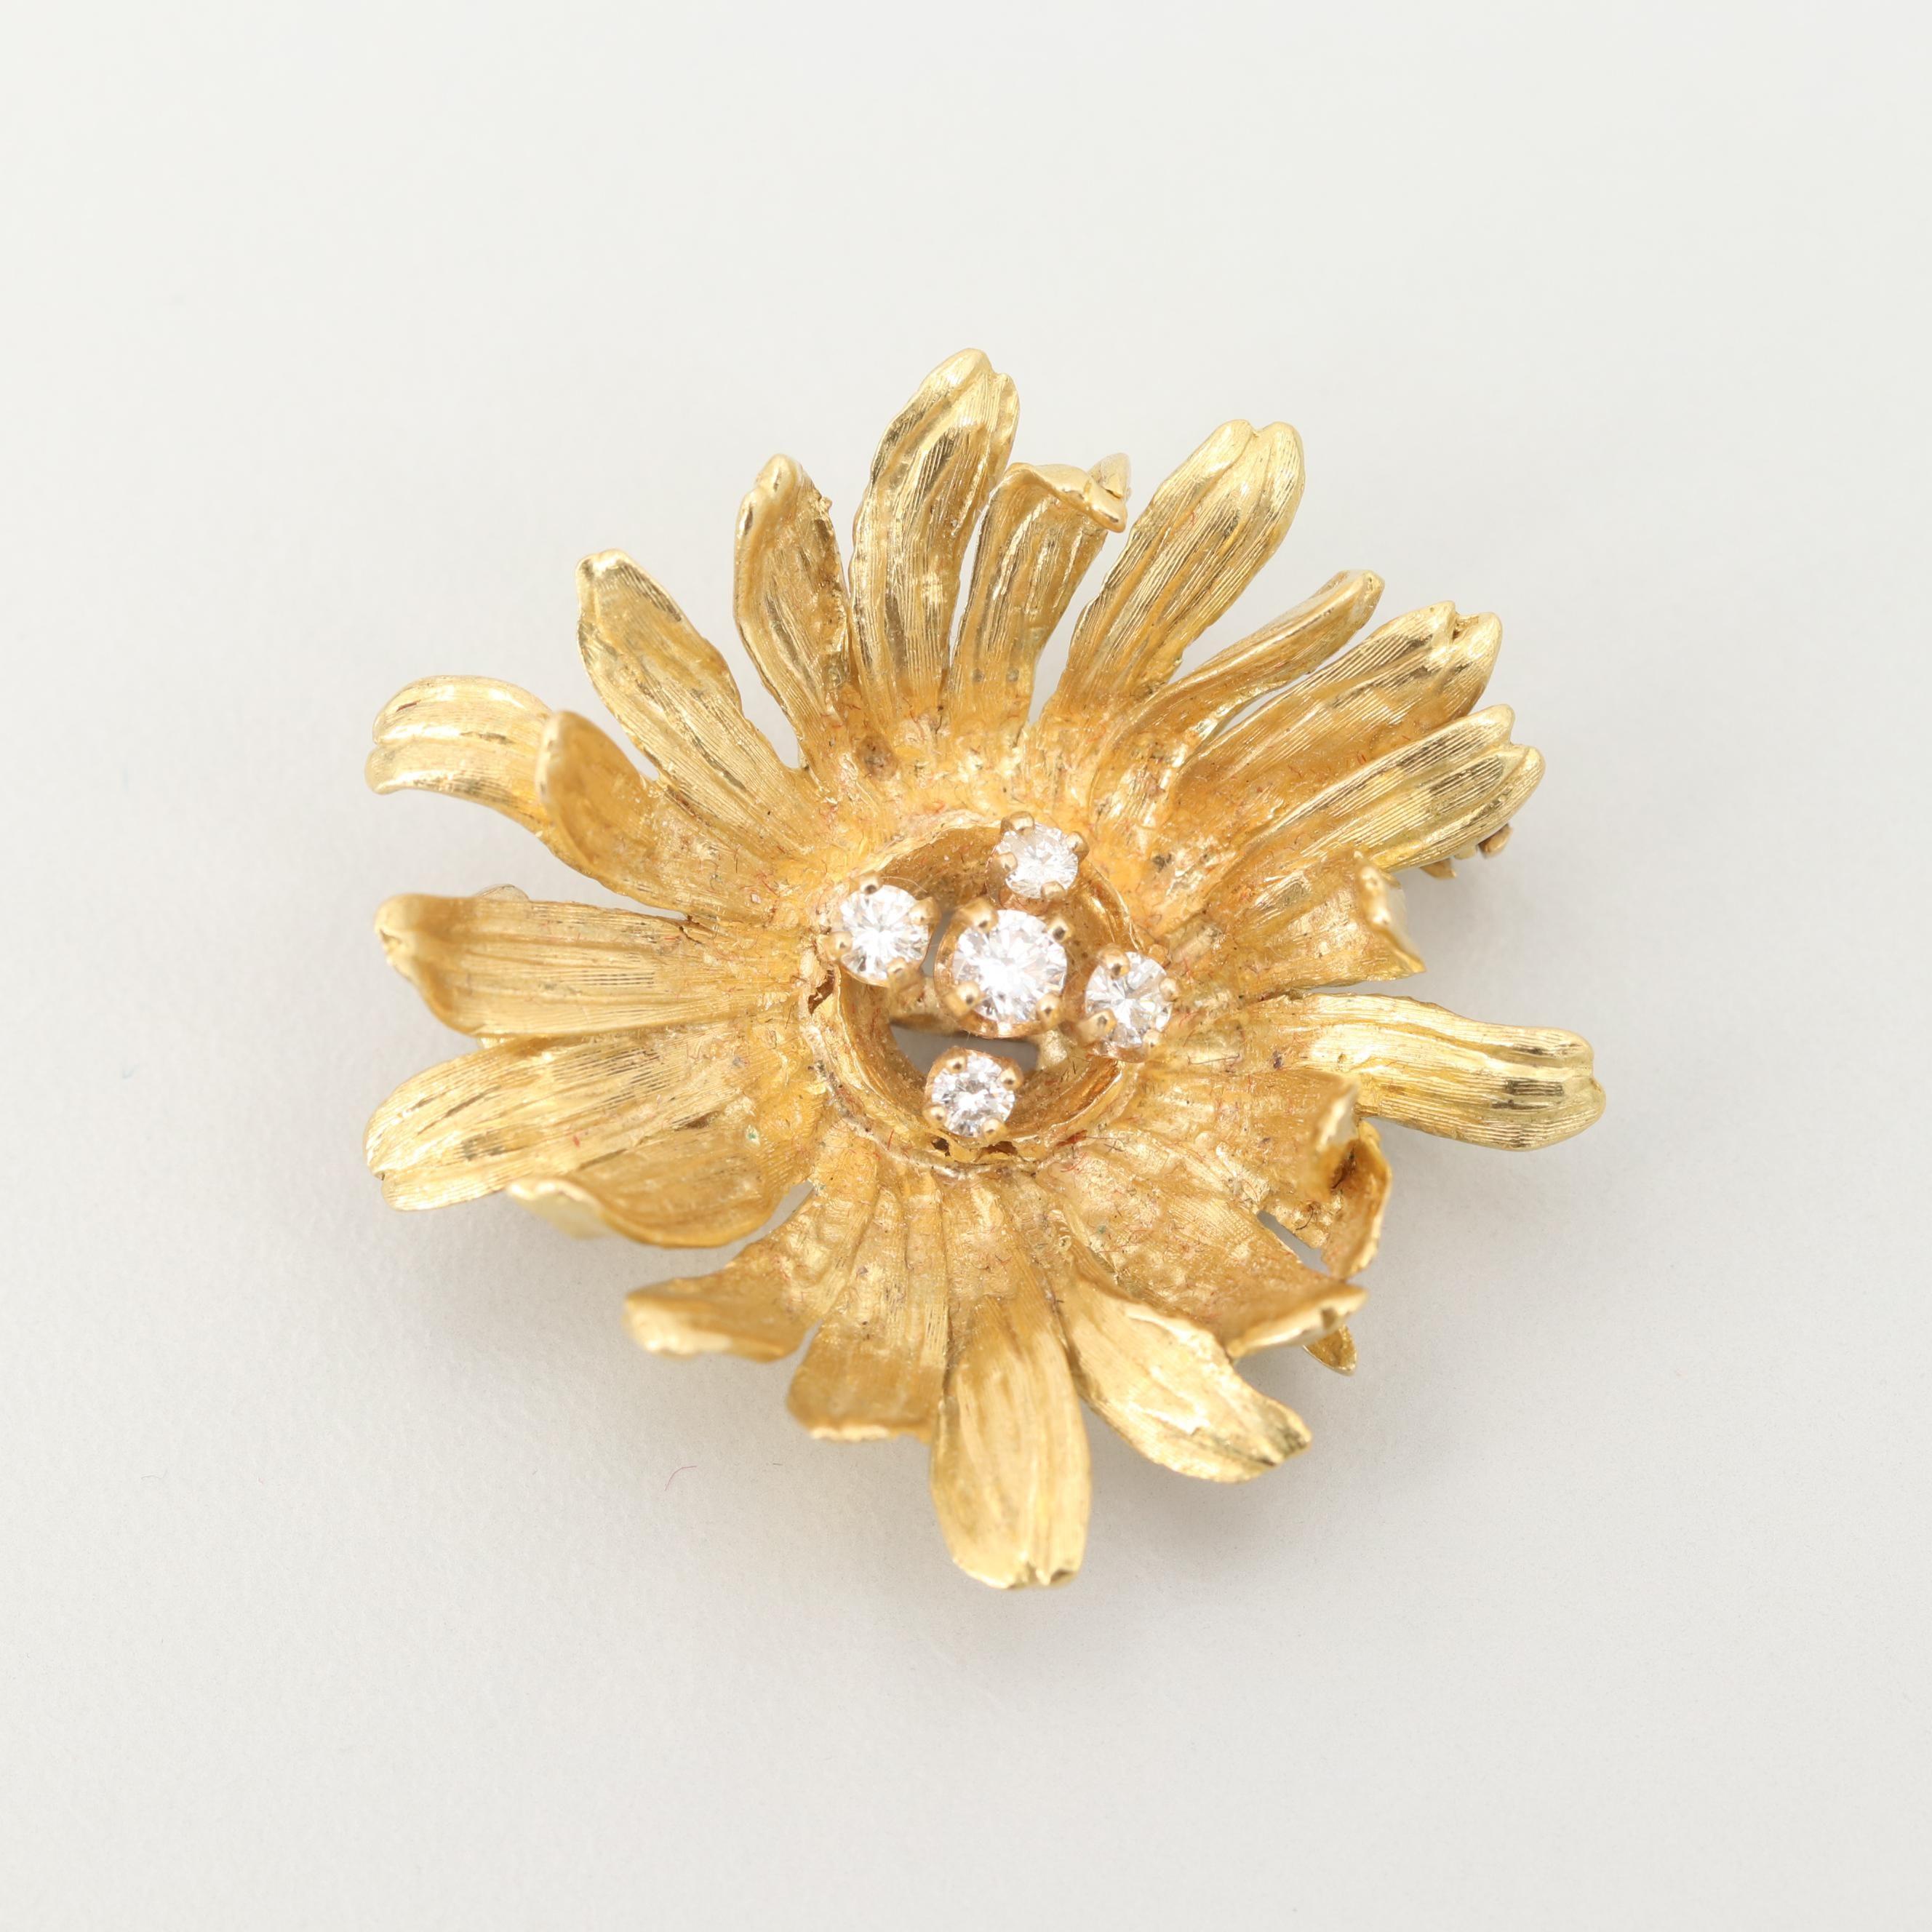 18K Yellow Gold Diamond Flower Blossom Brooch